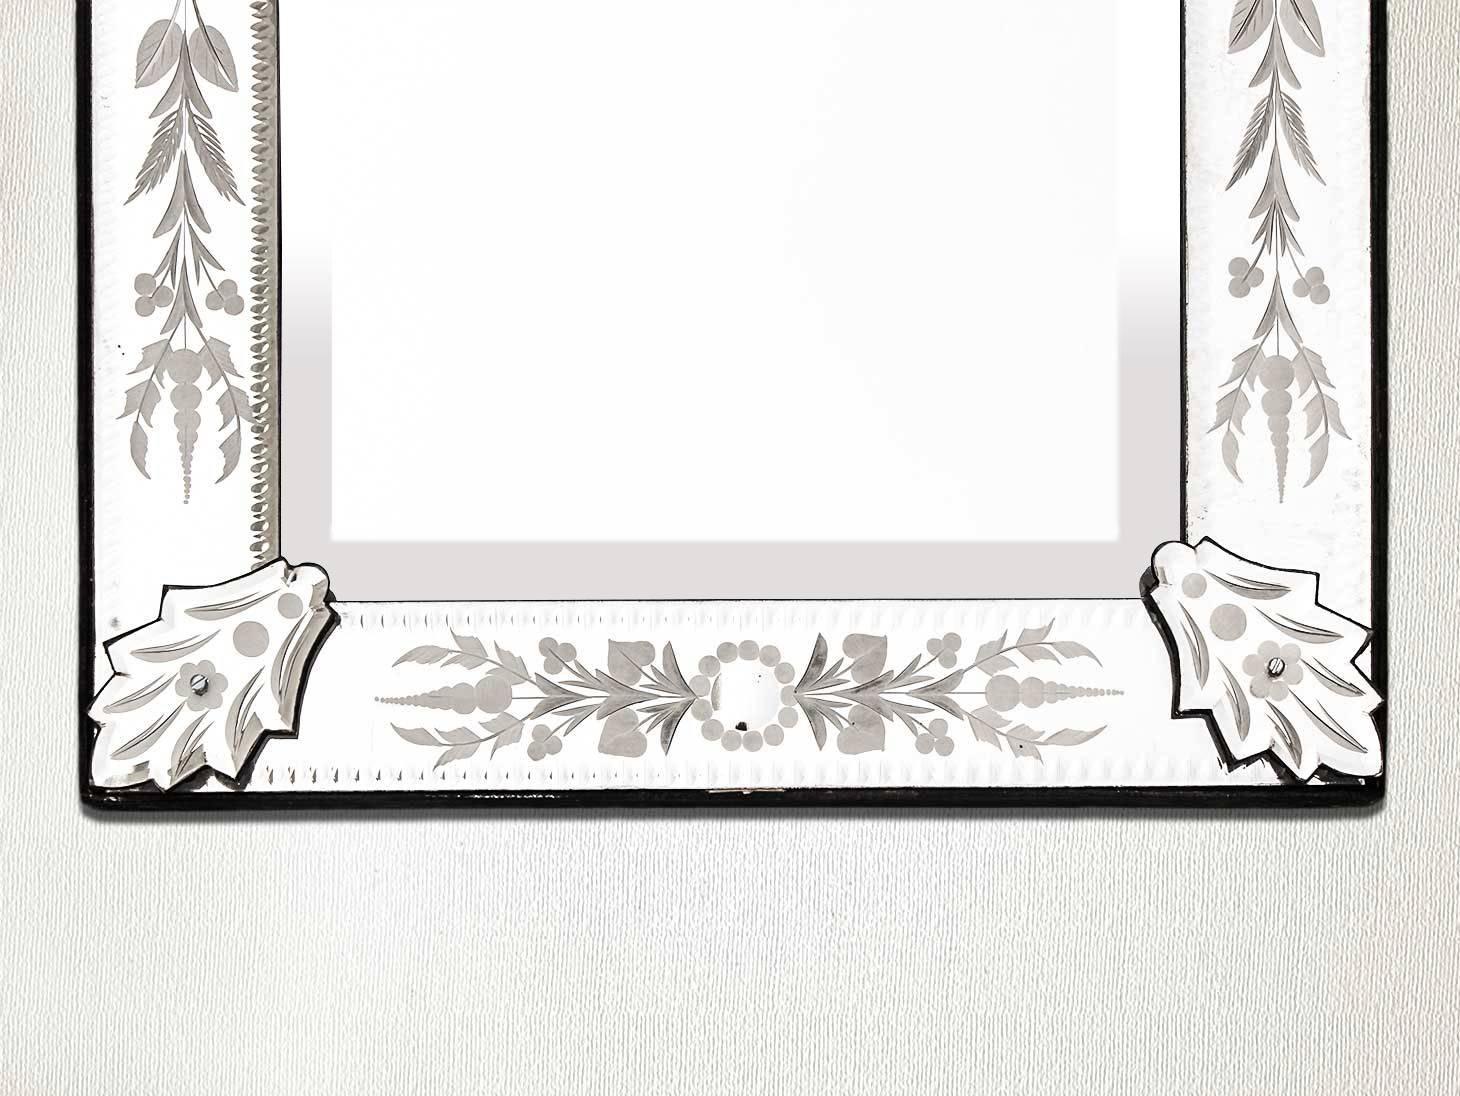 Venetian Mirror-46.5 Inches X 16 Inches regarding Long Venetian Mirrors (Image 20 of 25)